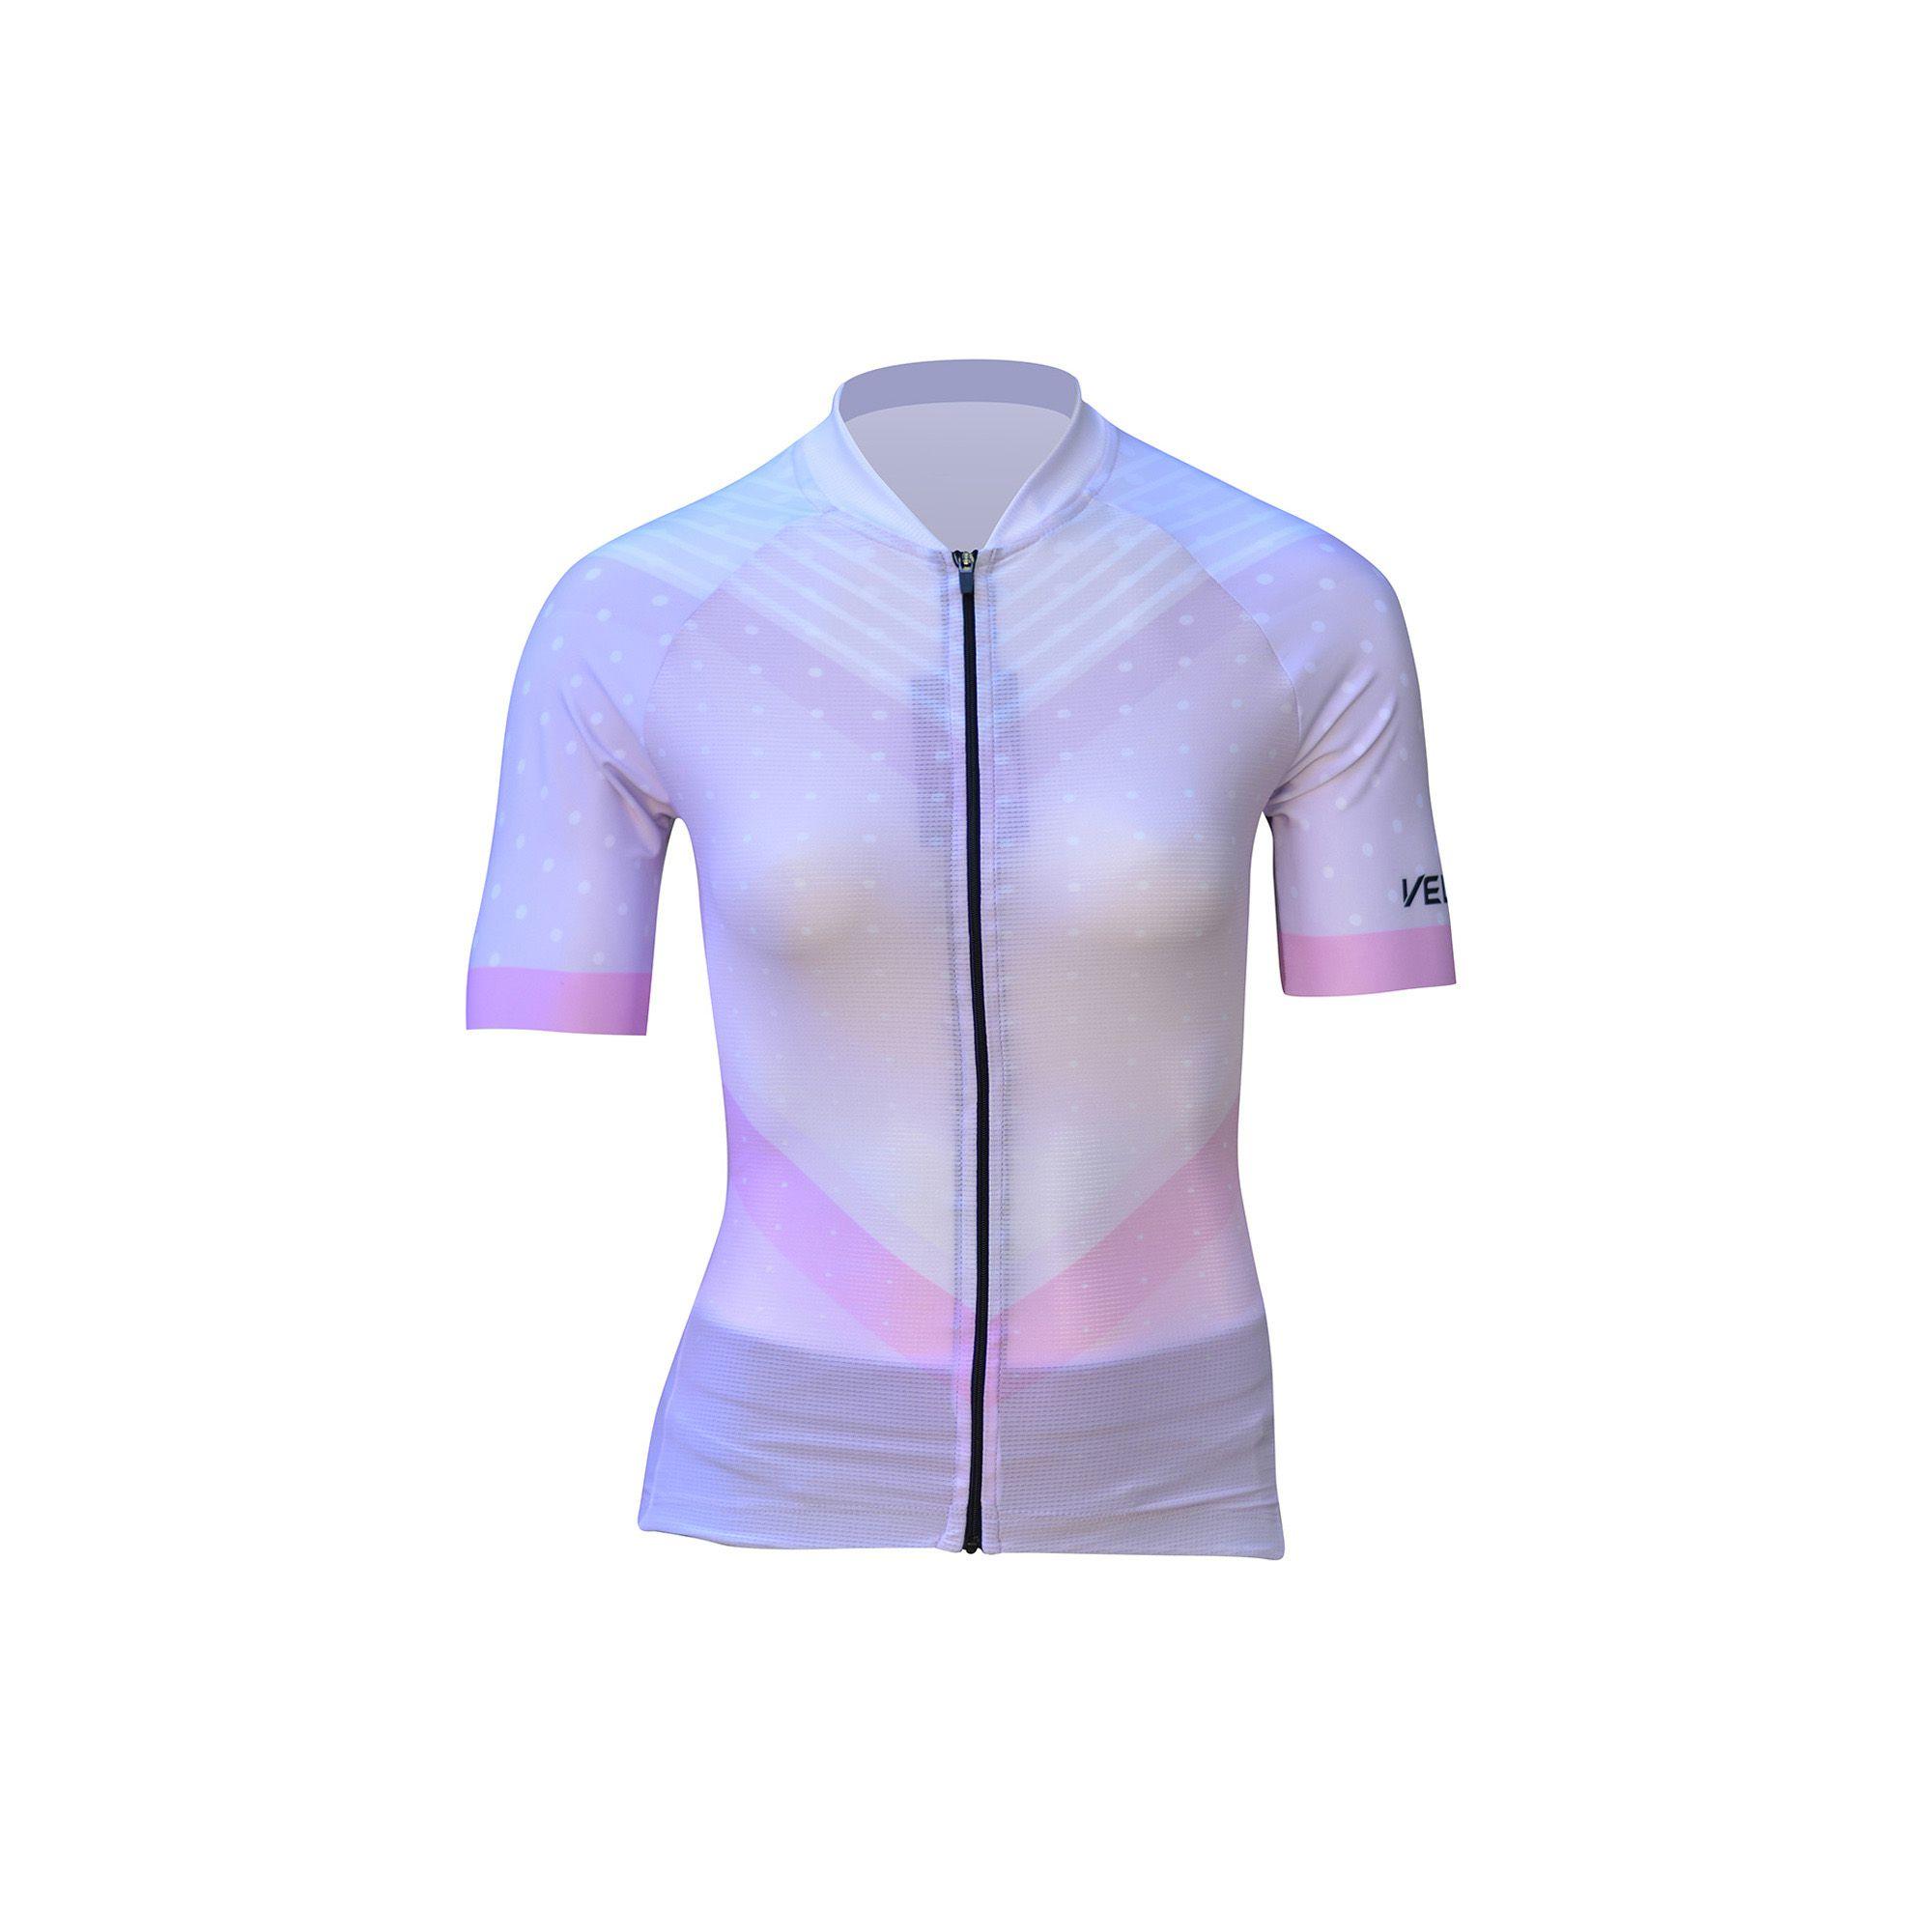 Camisa Velorock Lavanda Feminina